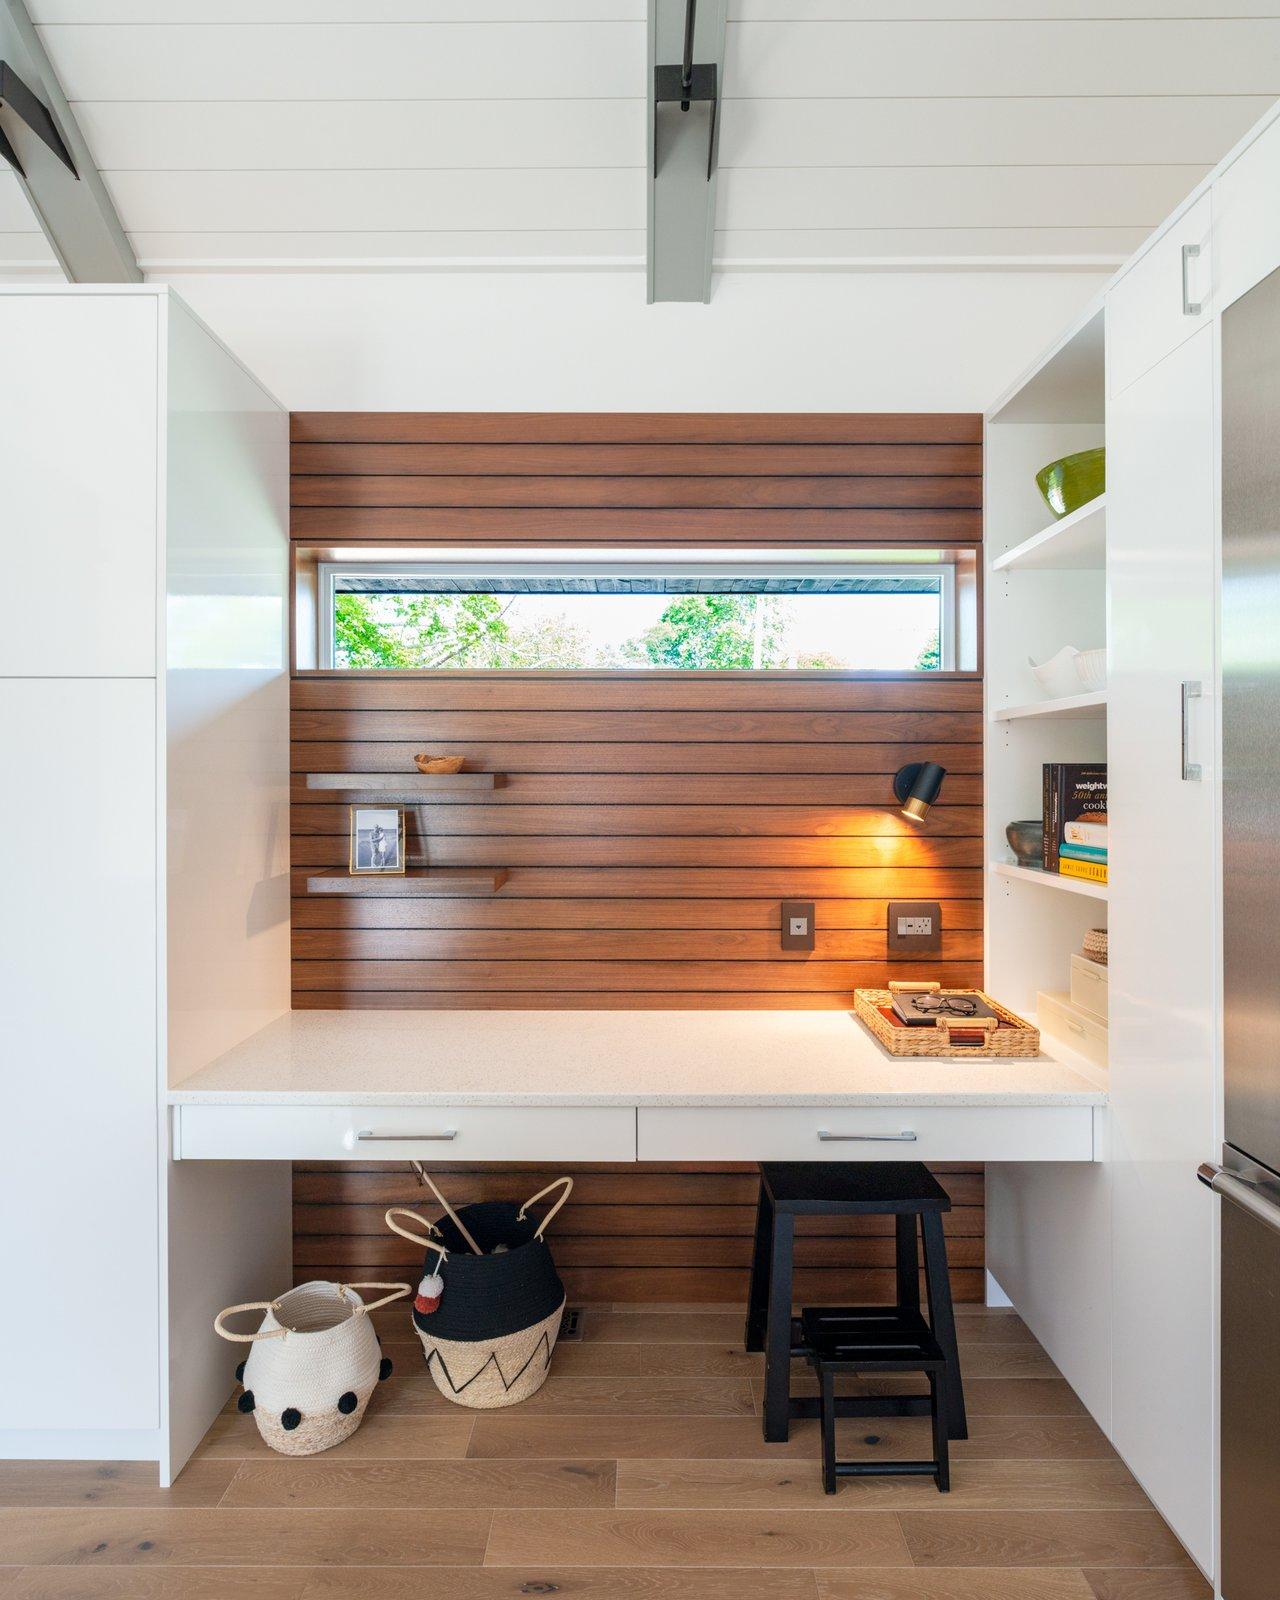 Office, Lamps, Desk, Storage, Shelves, and Medium Hardwood Floor Crichton Park -  Office Nook  CRICHTON PARK RENO by RHAD Architects